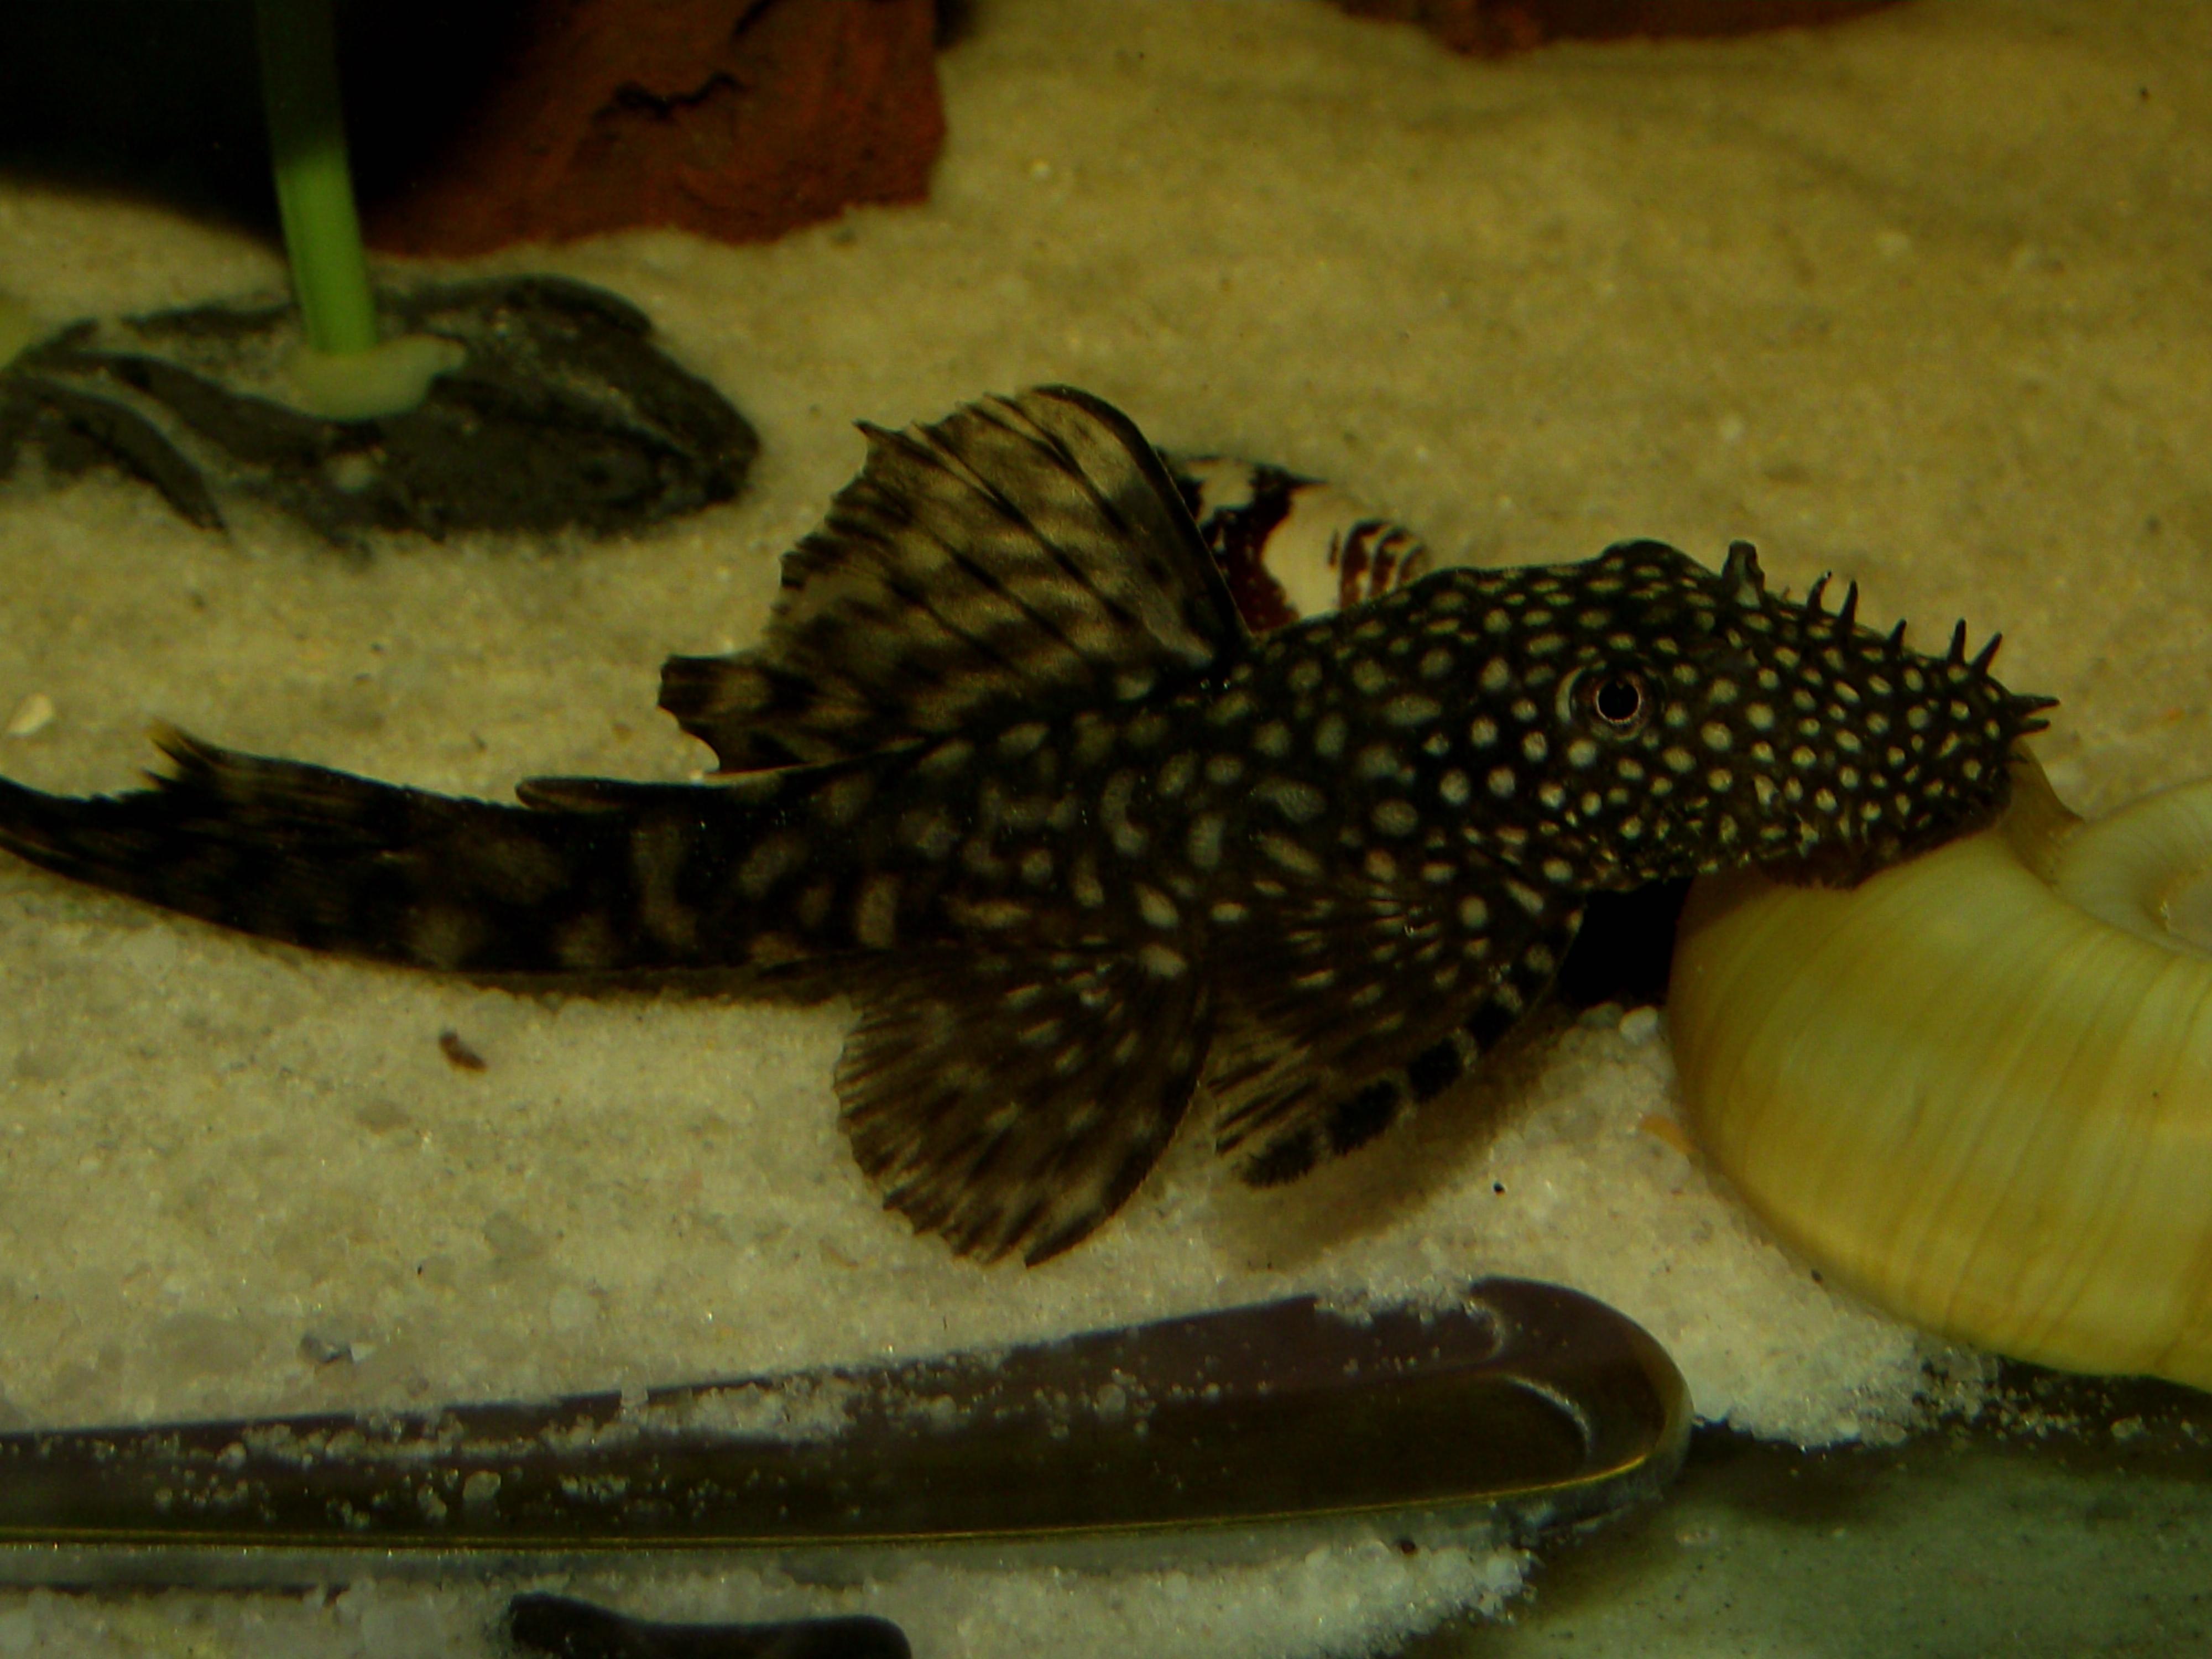 cichlids.com: Male Bristlenose Pleco